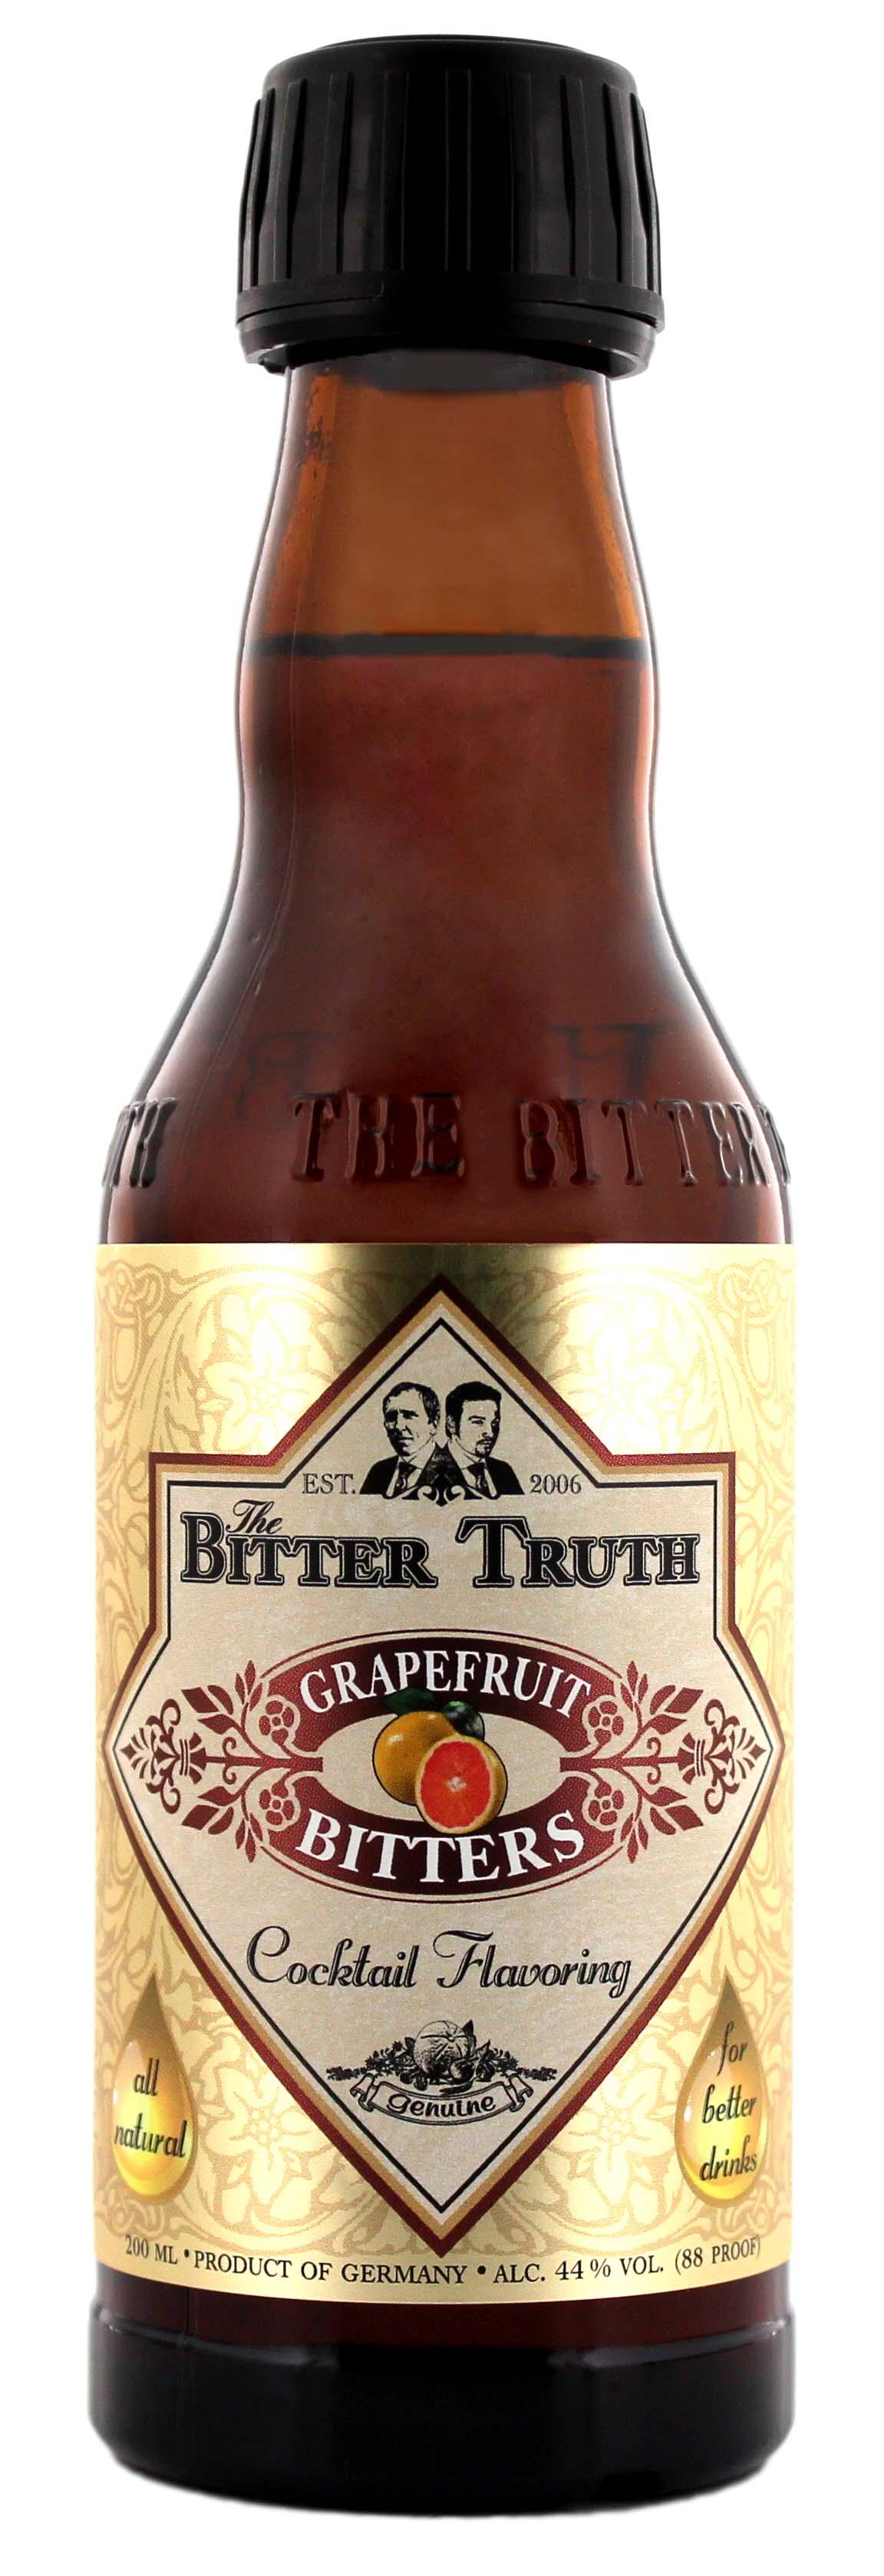 The Bitter Truth Grapefruit Bitters 0,2L